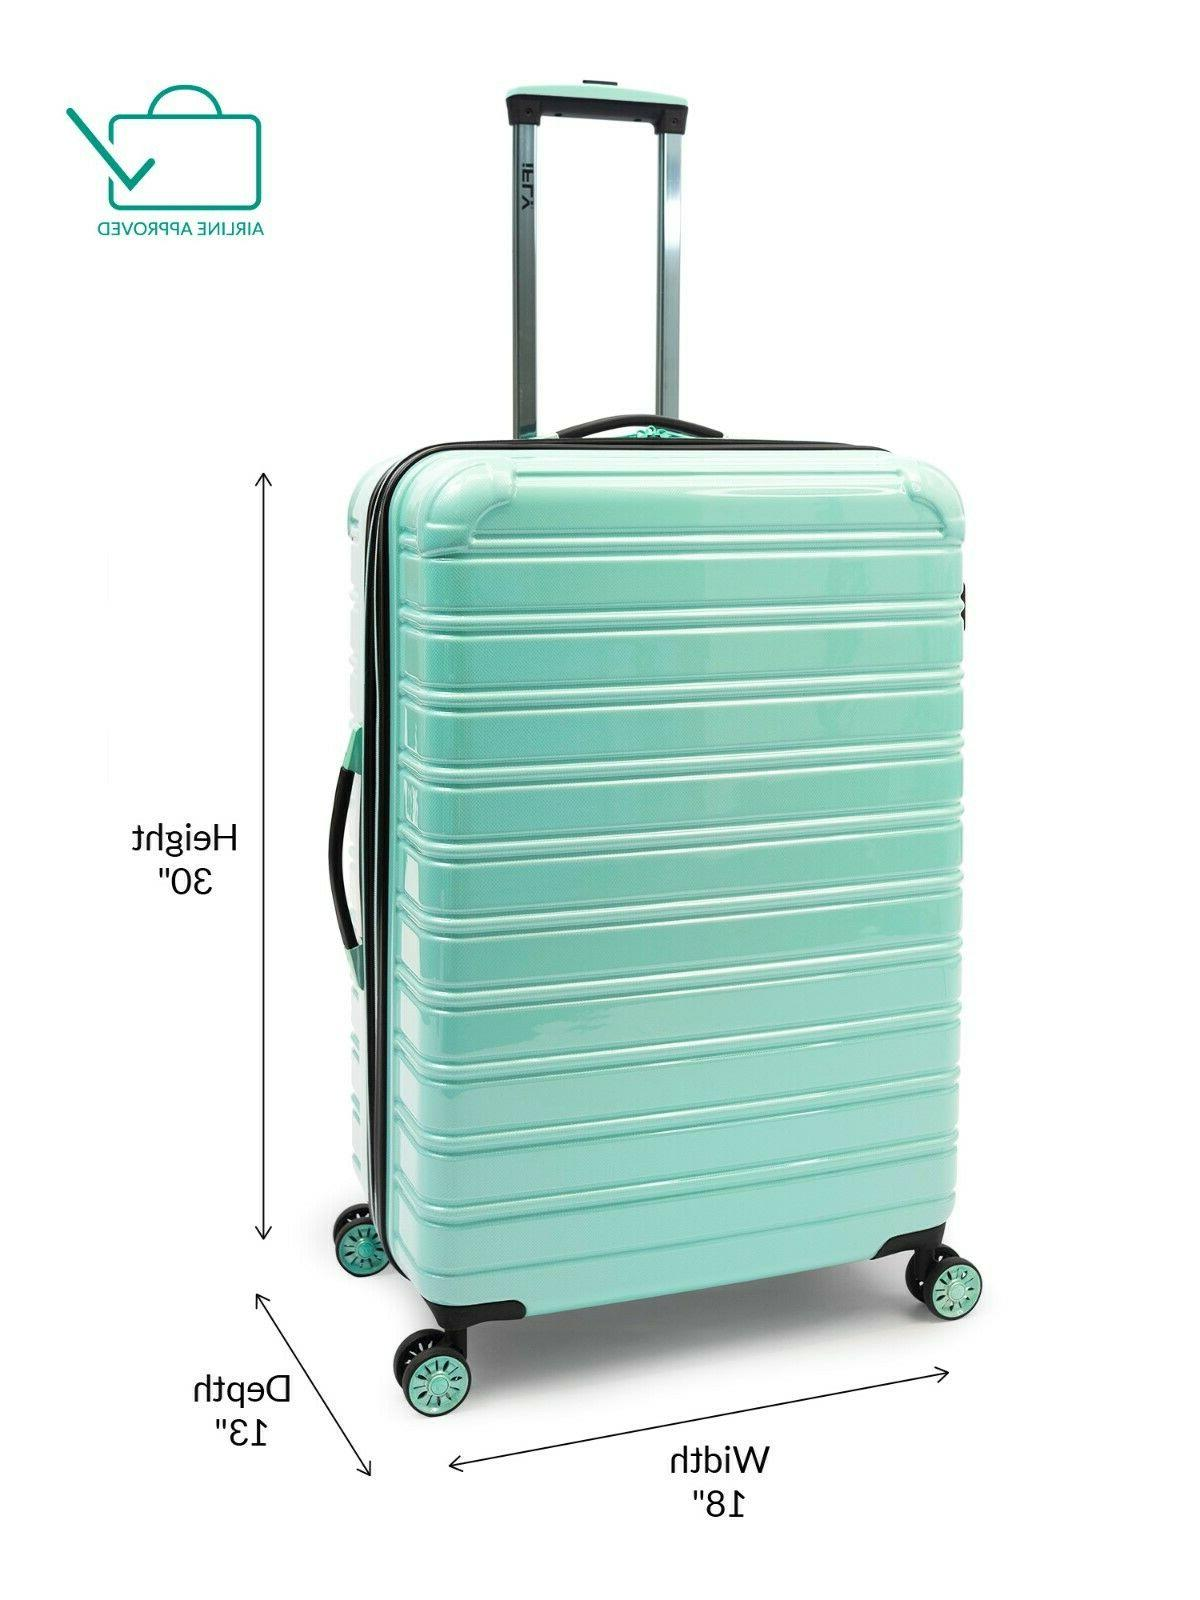 iFLY Ifly Luggage,